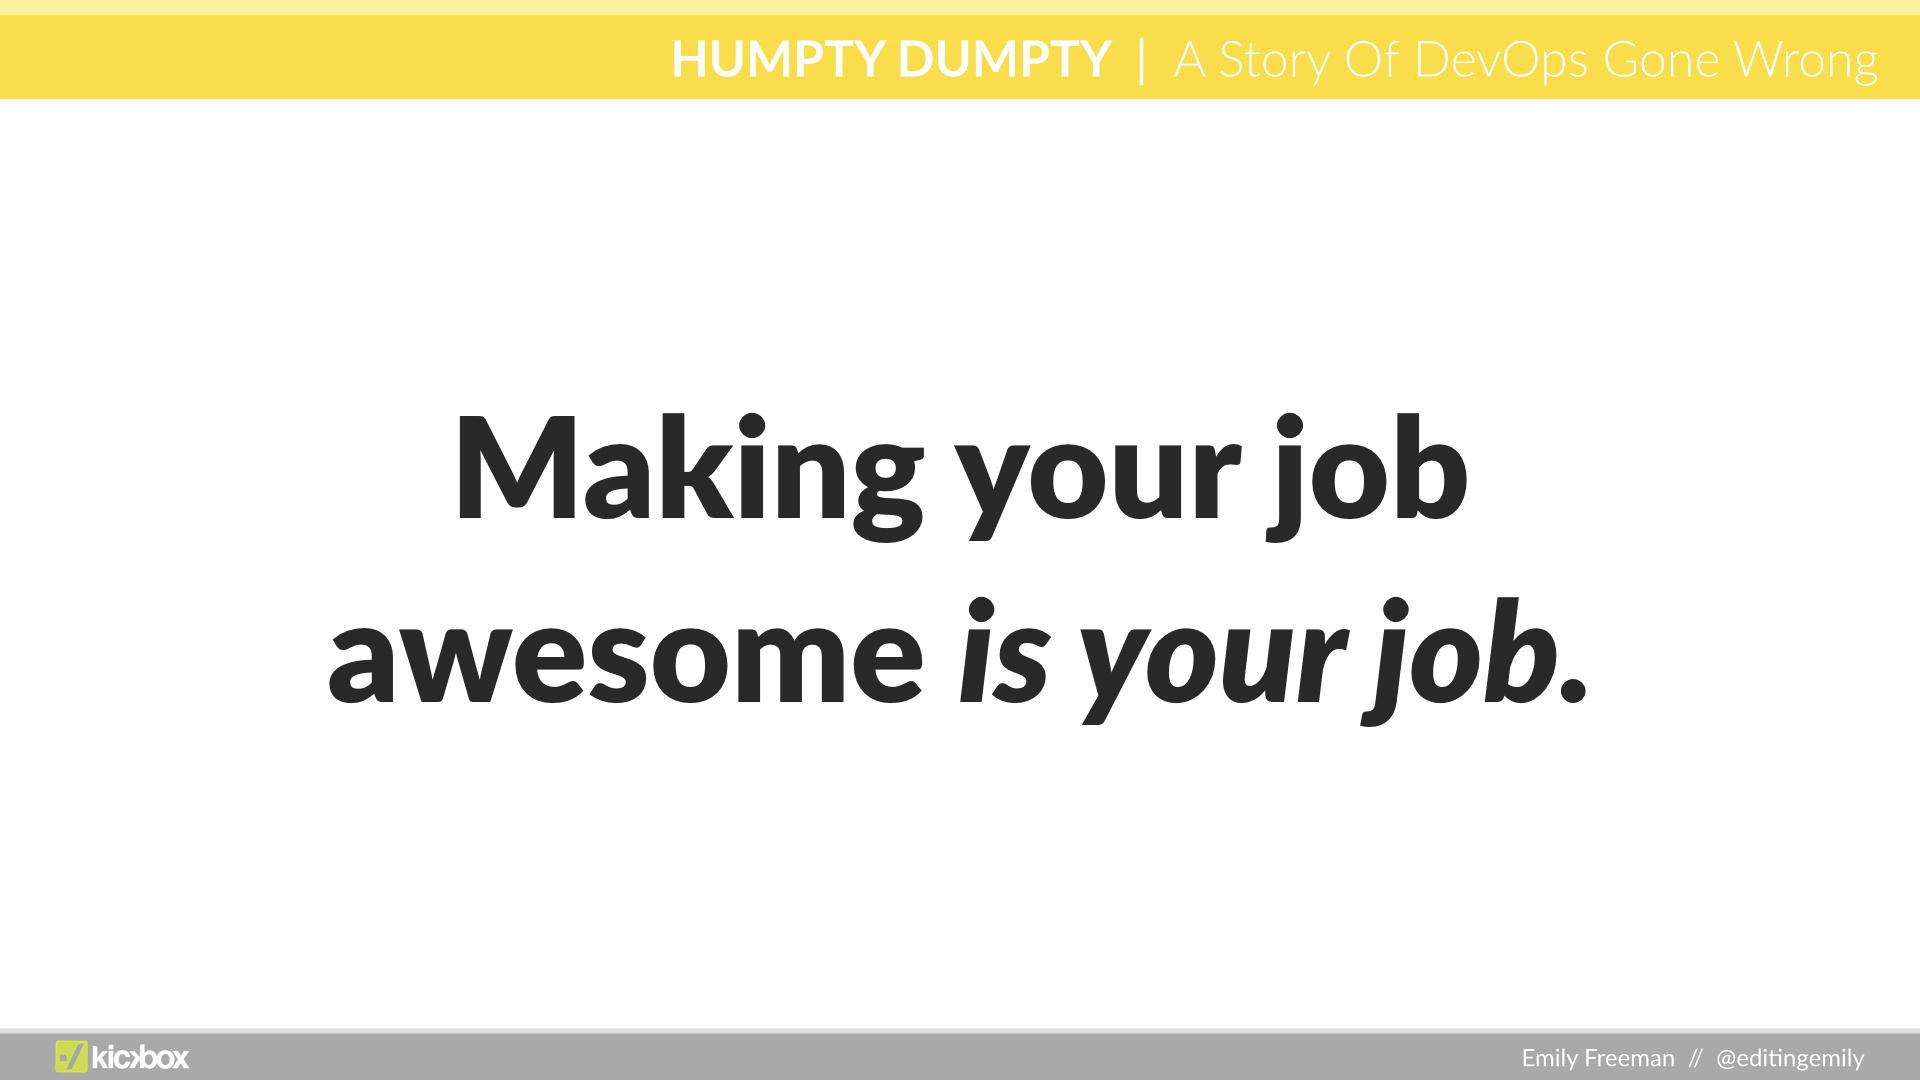 HumptyDumptyDevOps_v3.053.jpeg